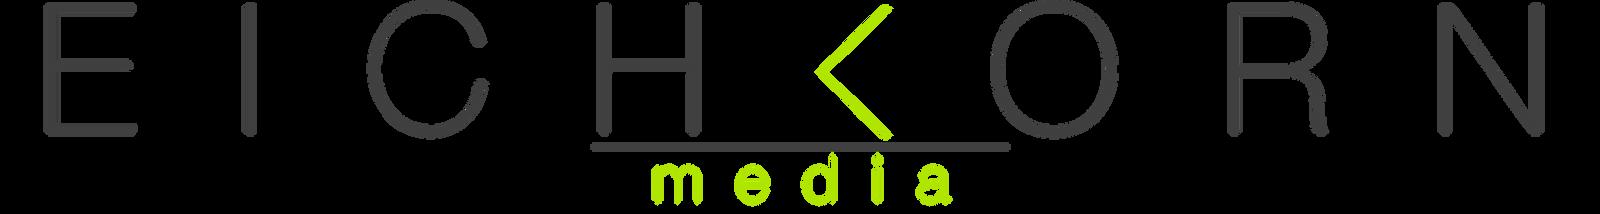 WortmarkeAllVersions media 25 by EICHKORN-media